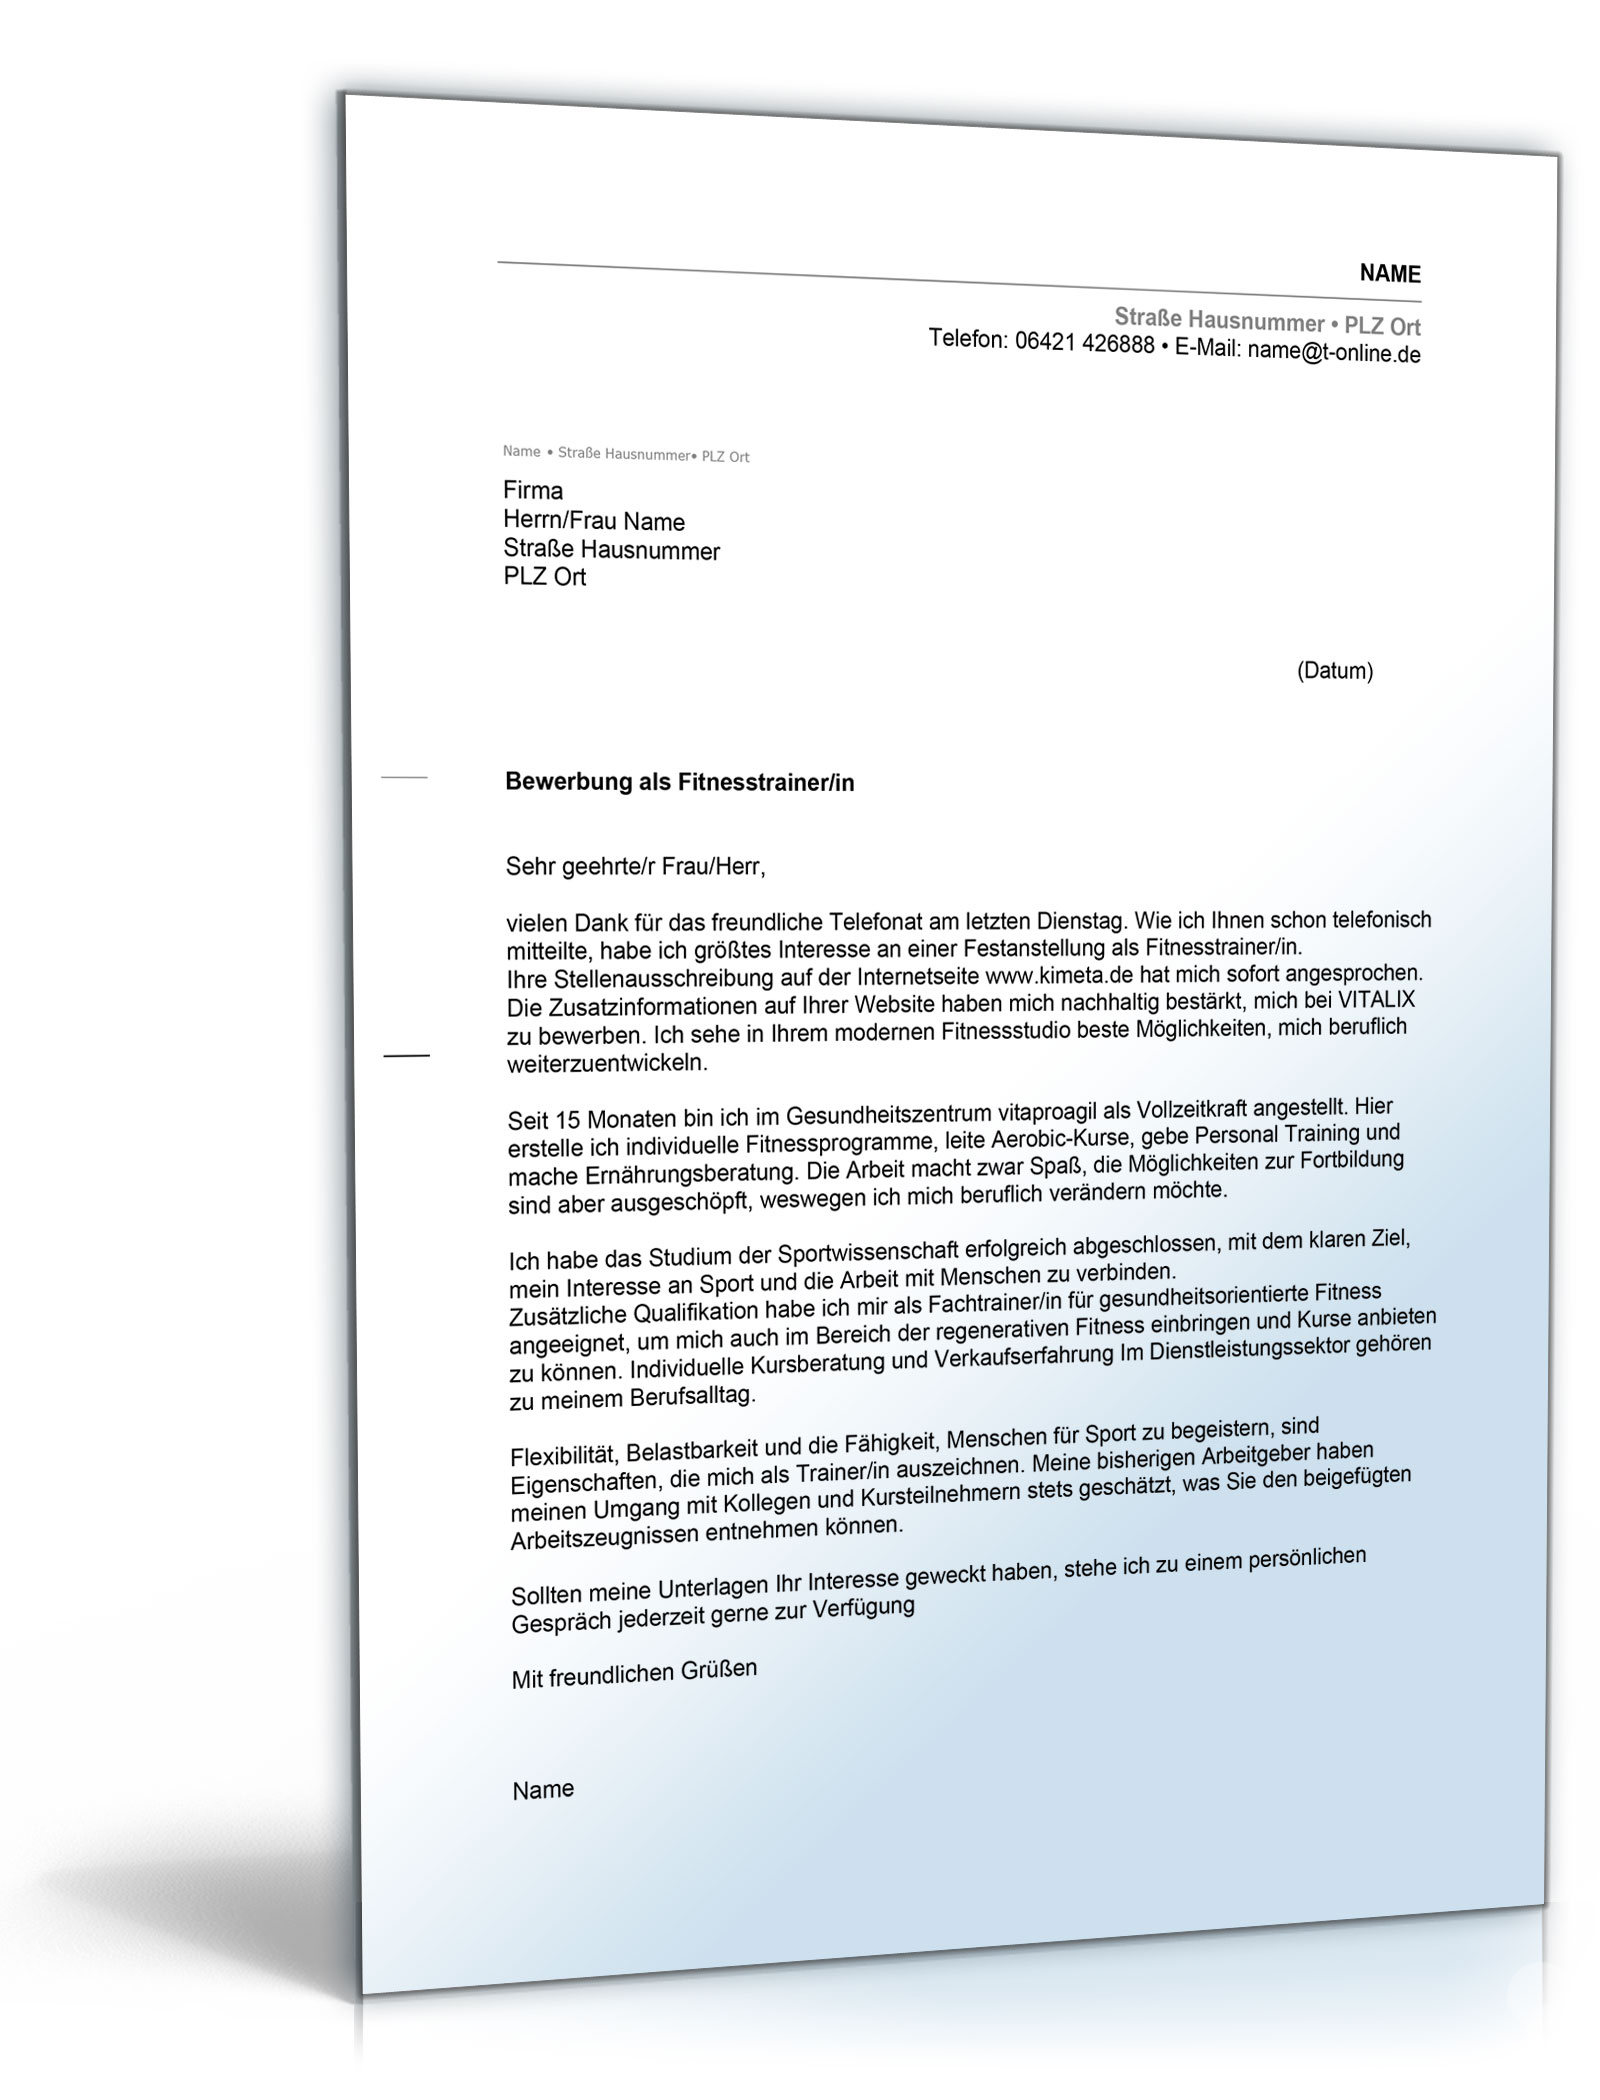 anschreiben bewerbung fitnesstrainer word dokument download amazonde software - Bewerbung Fitnesstrainer